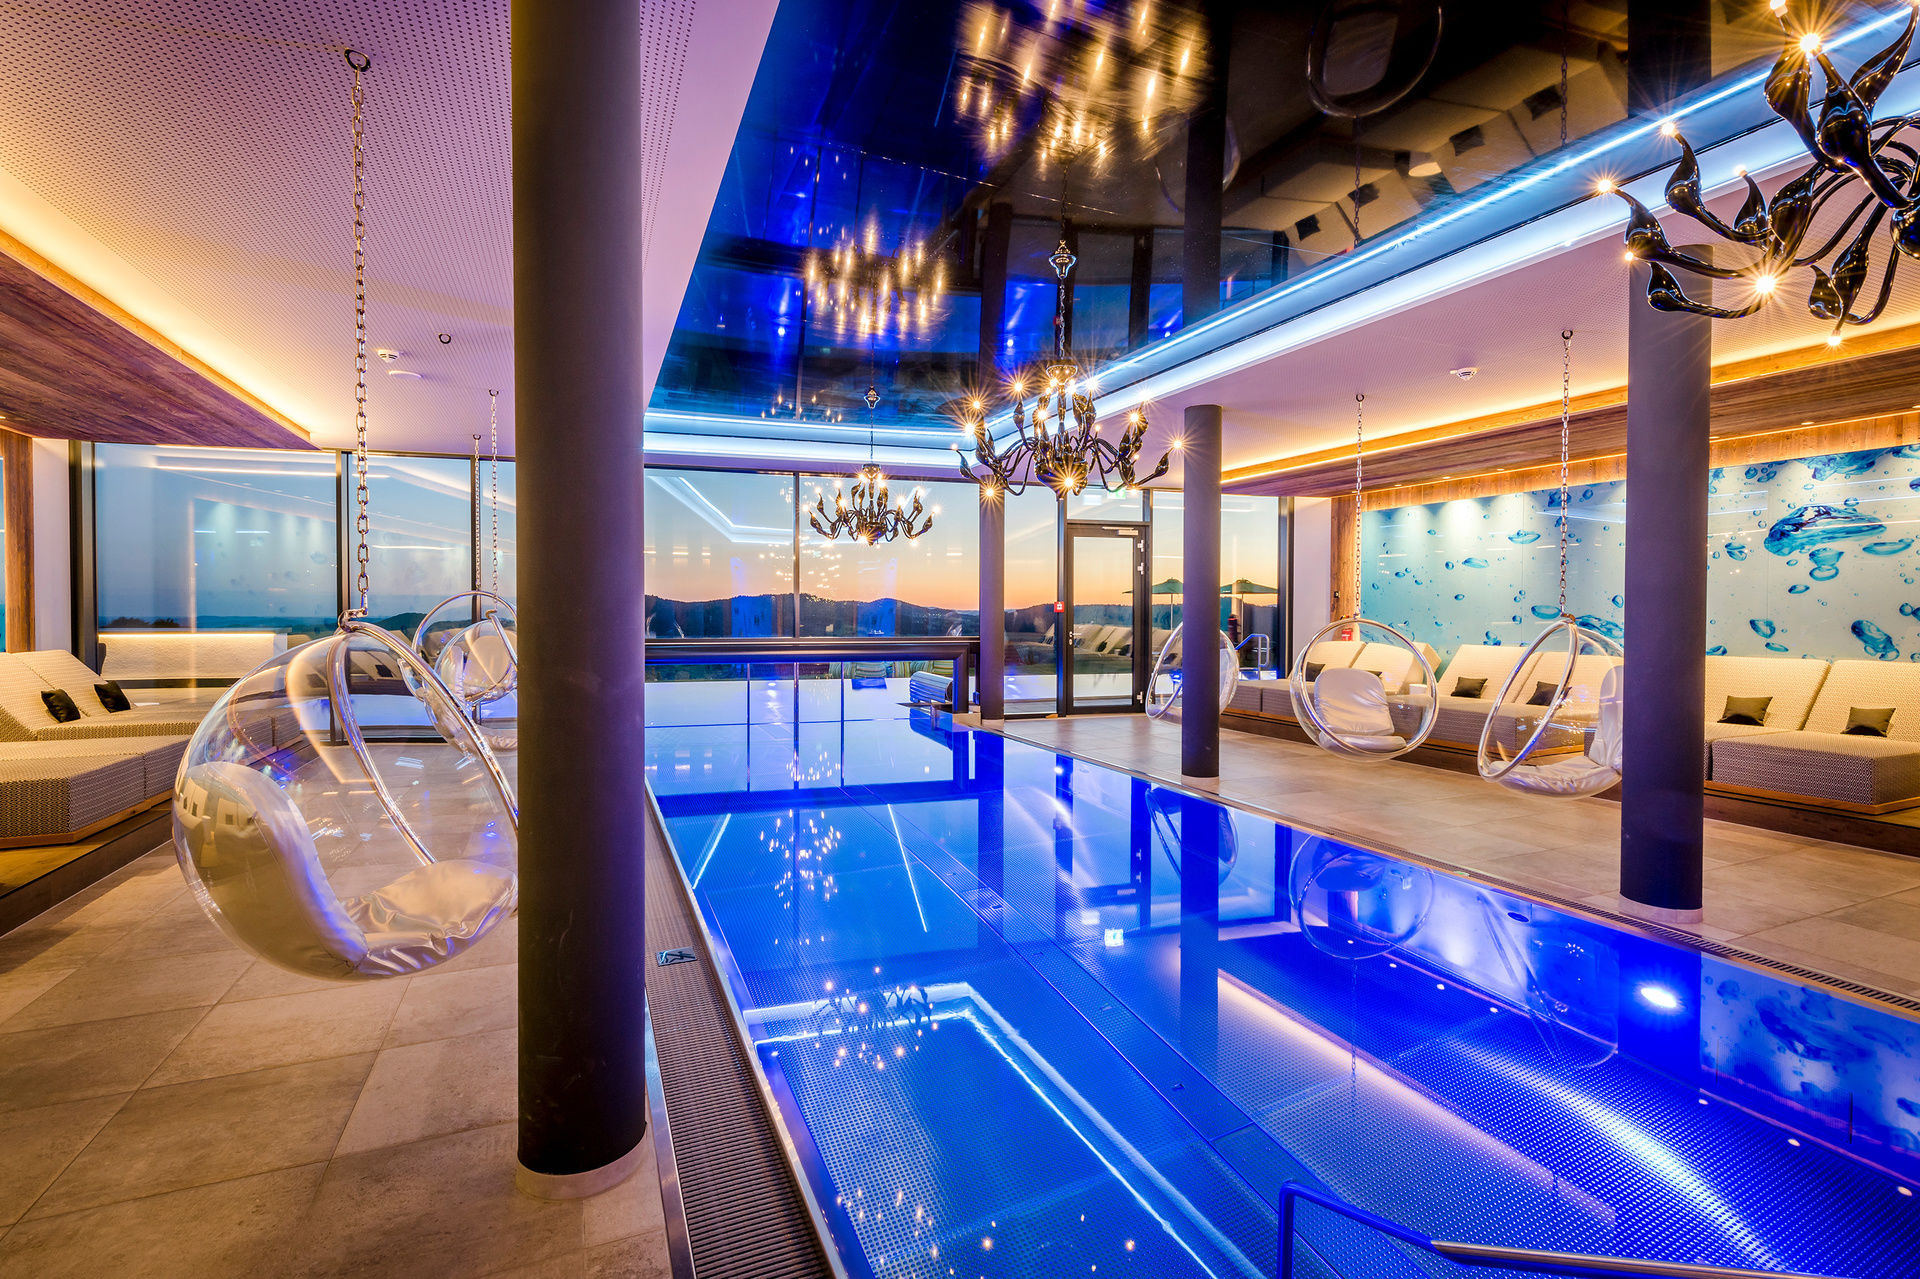 Infinity pool wellnesshotel h ttenhof bayersicher wald for Dusseldorf hotel mit pool